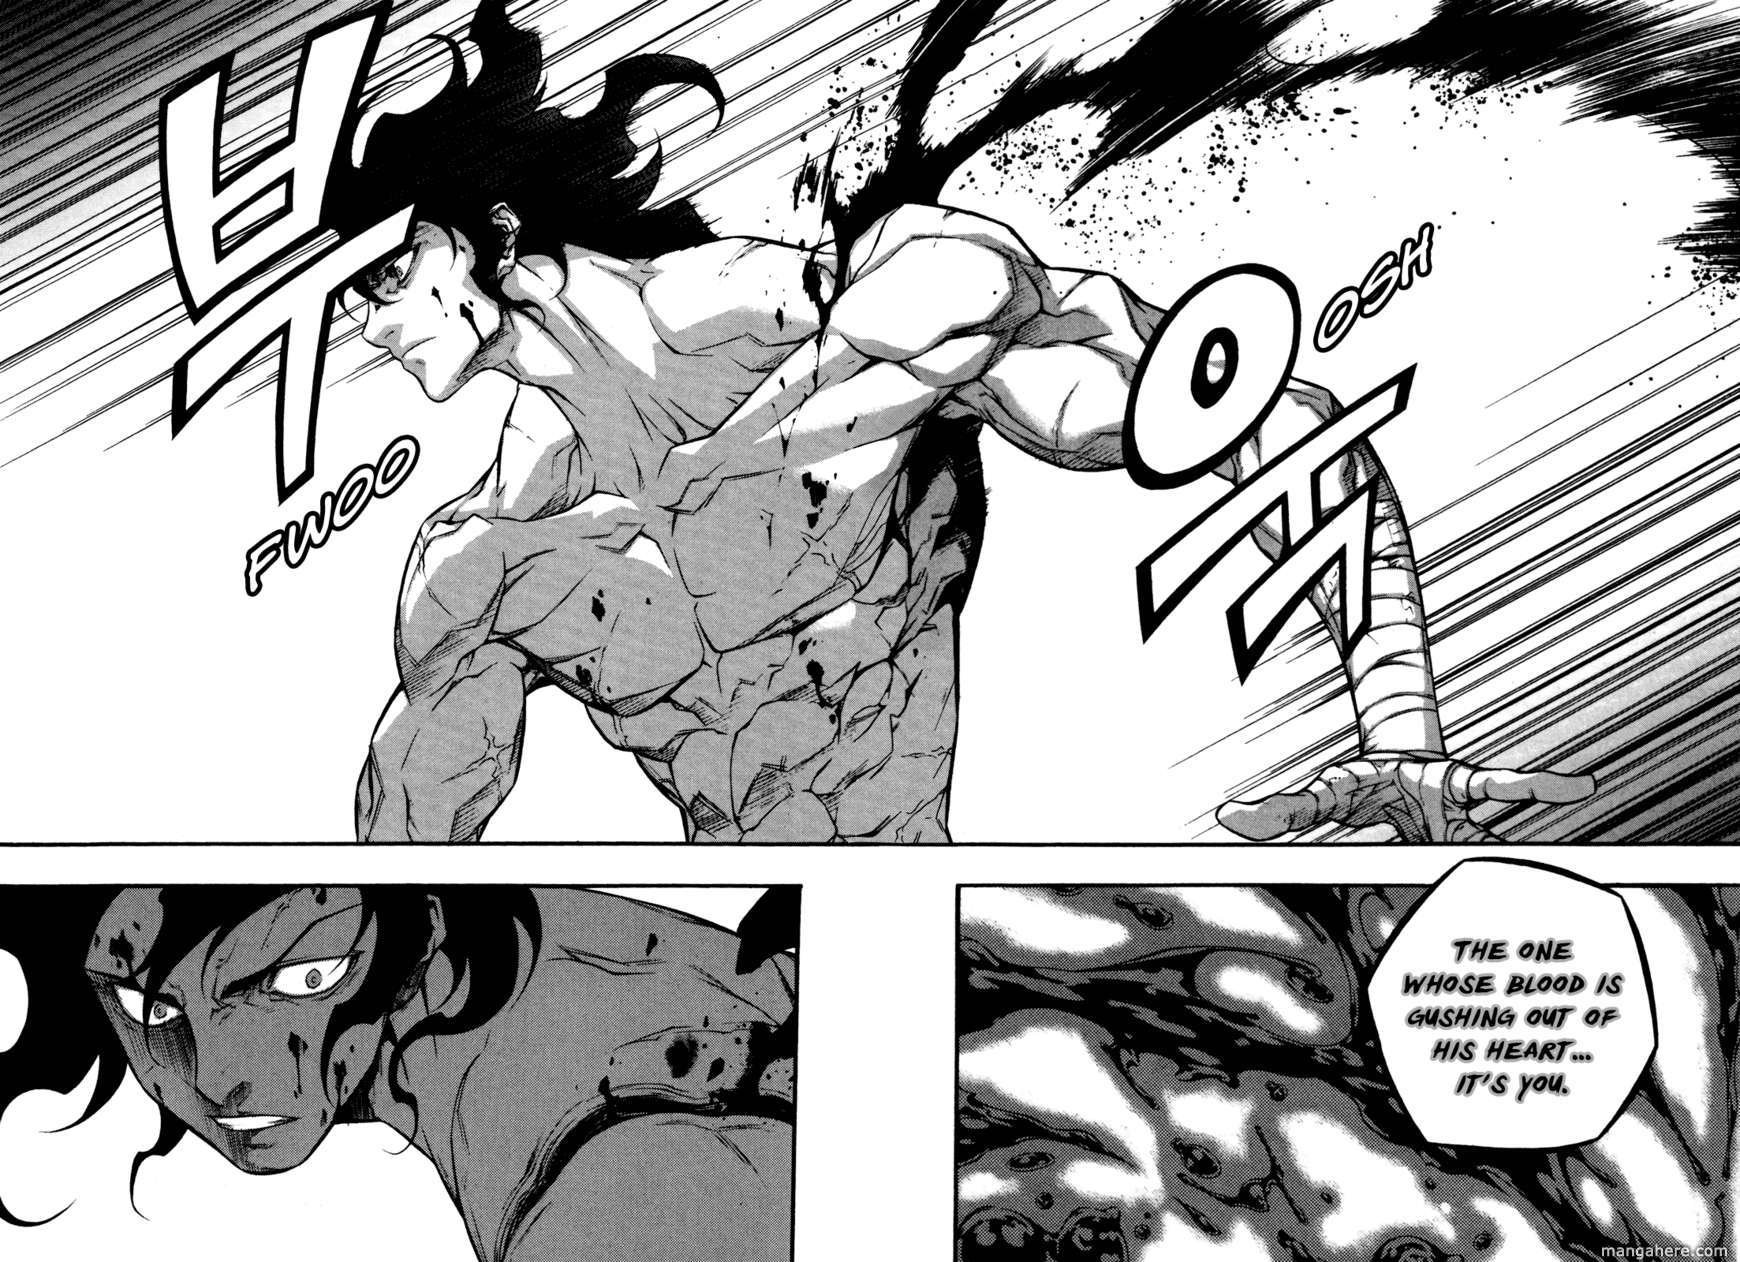 Hell Blade Action Manga Fighting Hellblade Wallpaper 1740x1262 438647 Wallpaperup